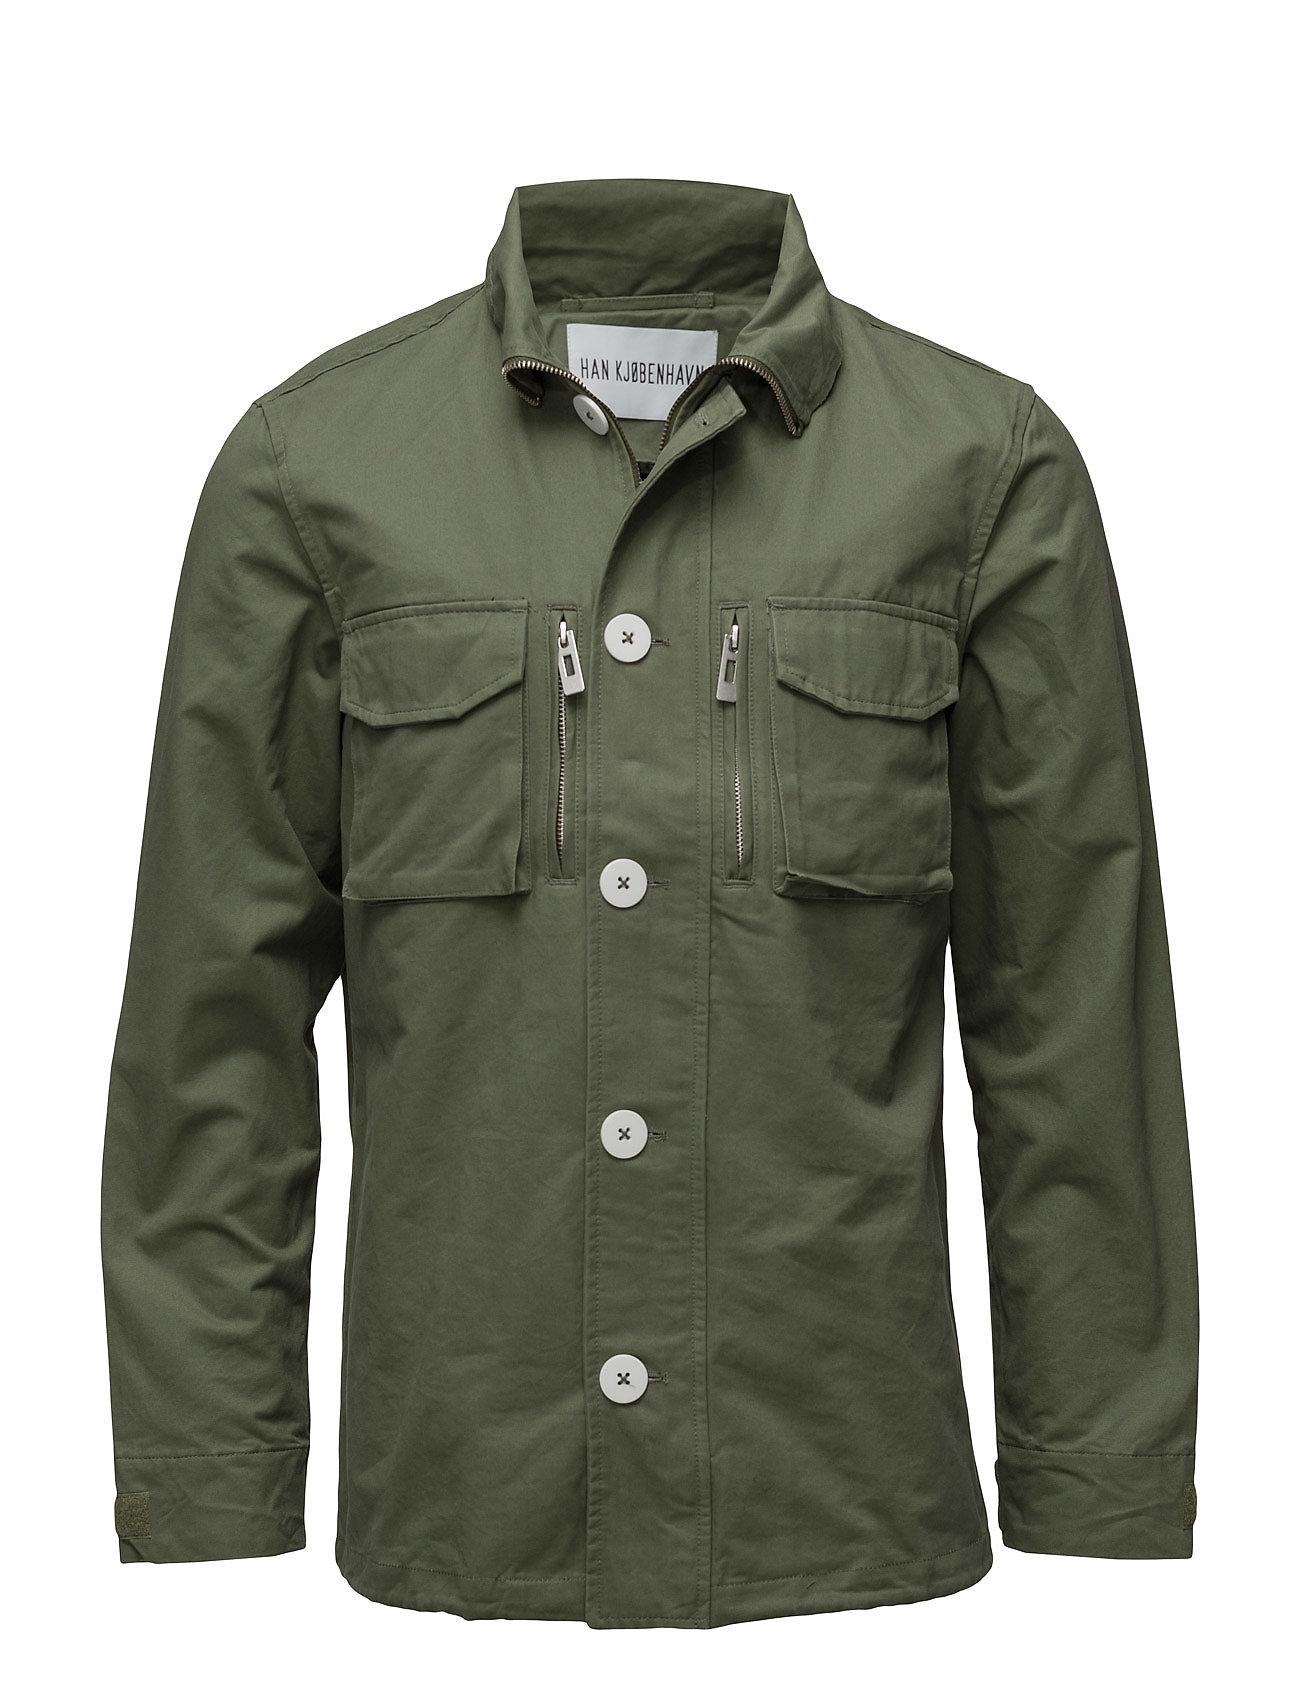 Outer jacket fra han kjã¸benhavn på boozt.com dk